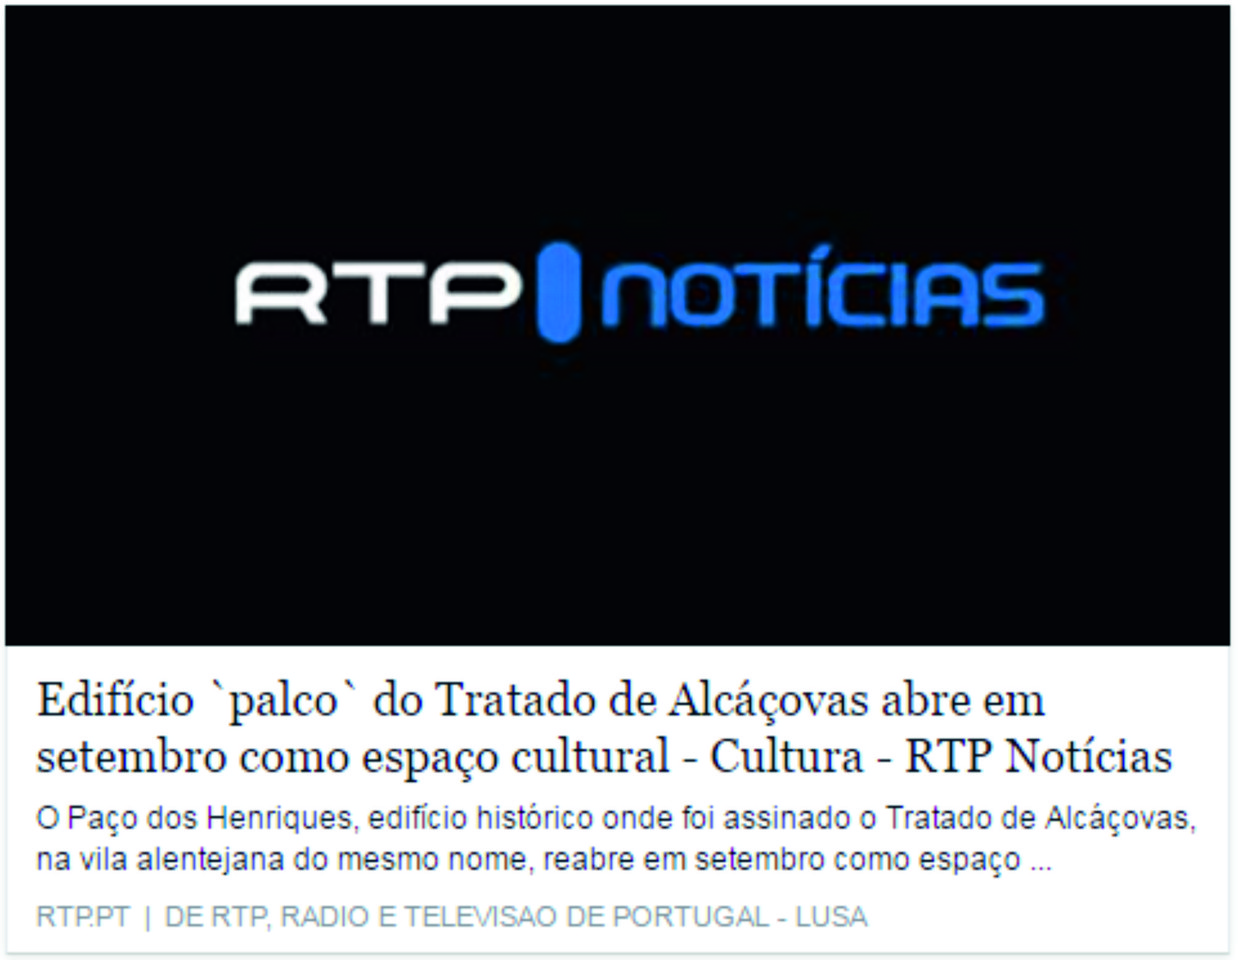 1_Noticia_RTP.jpg